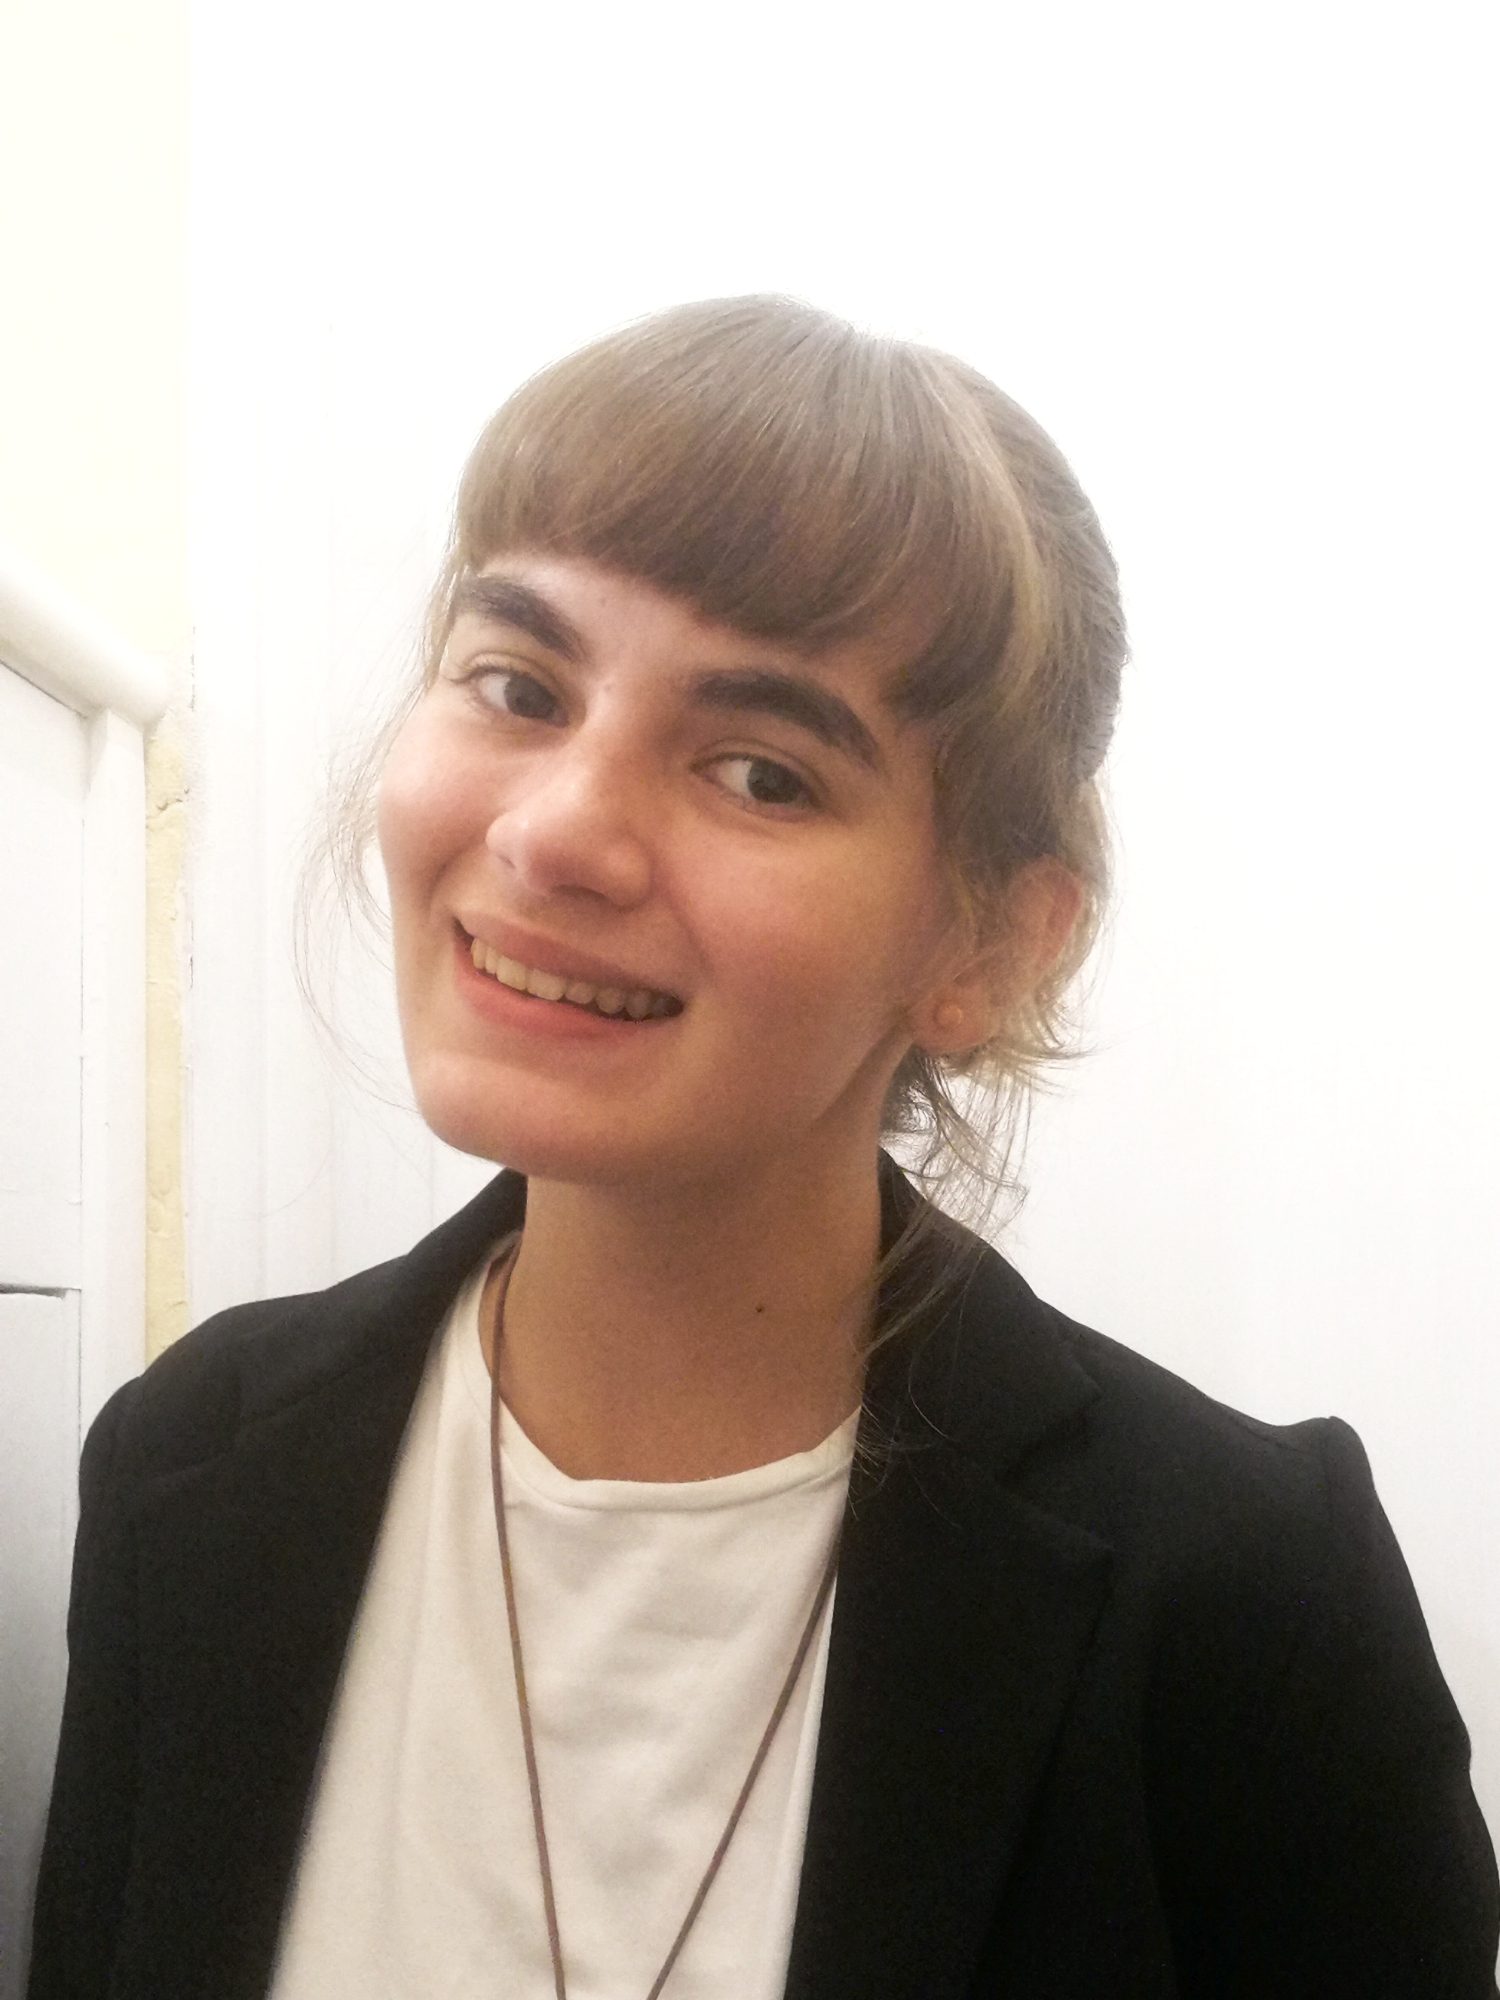 Renée Bertini - Digital Communications Coordinatorrbertini@standnow.org